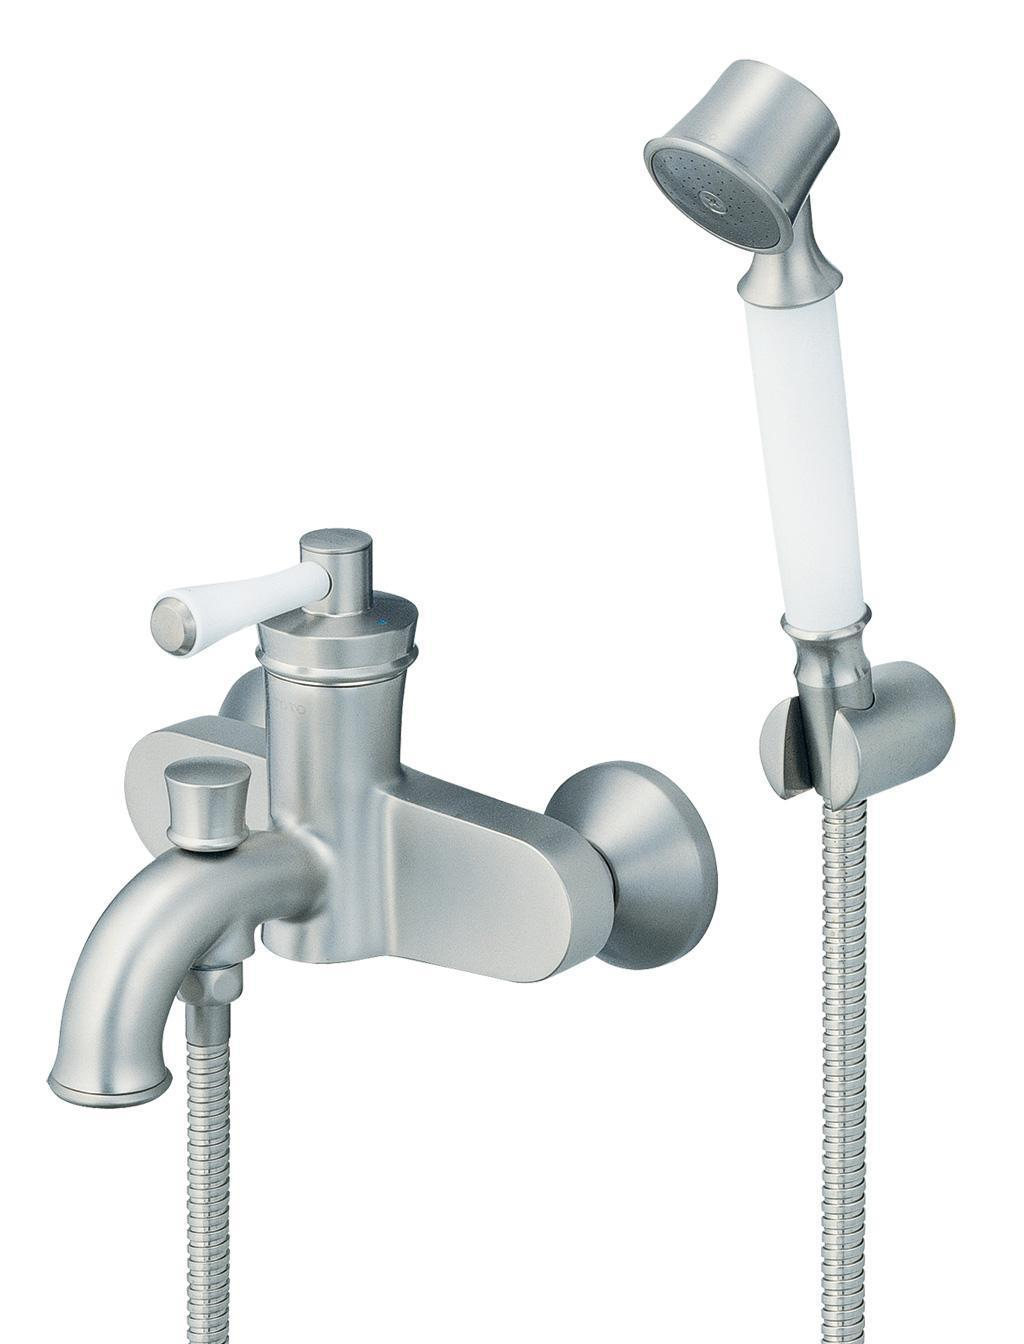 TOTO淋浴/盆池用入墙式龙头DM307CDF1#HNDM307CDF1#HN